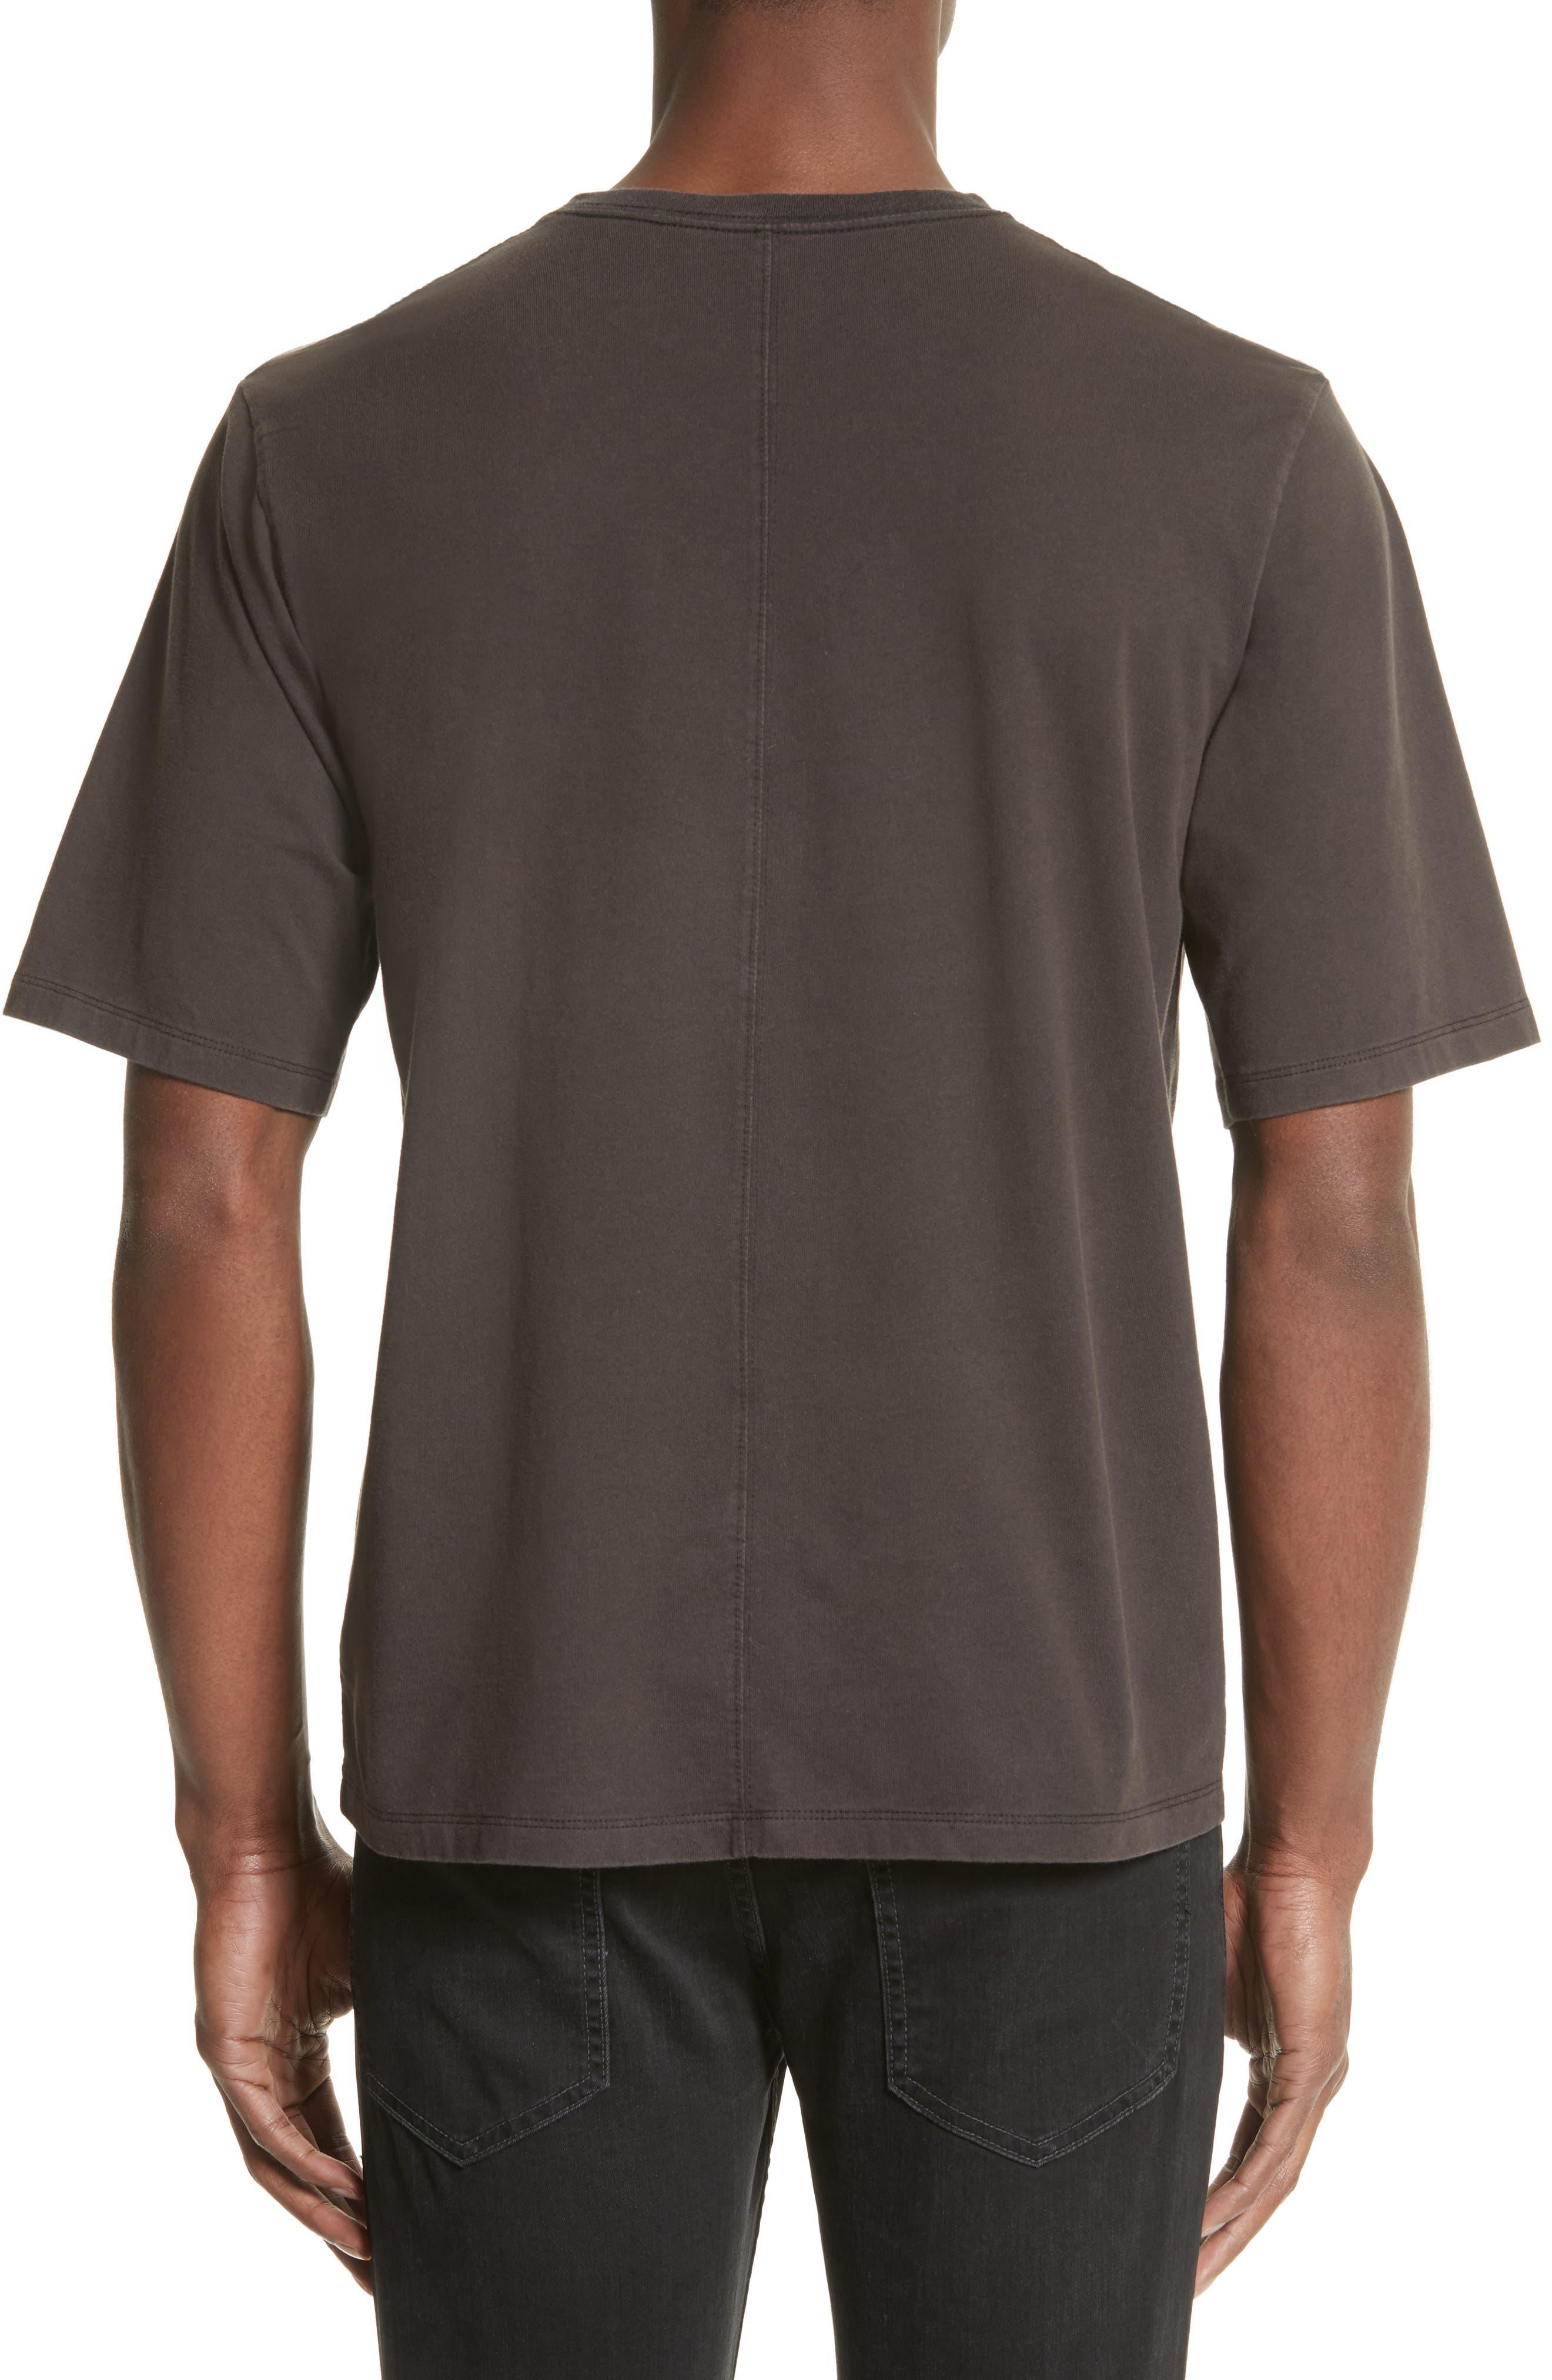 Alternate Image 2  - OVADIA & SONS Type-01 T-Shirt